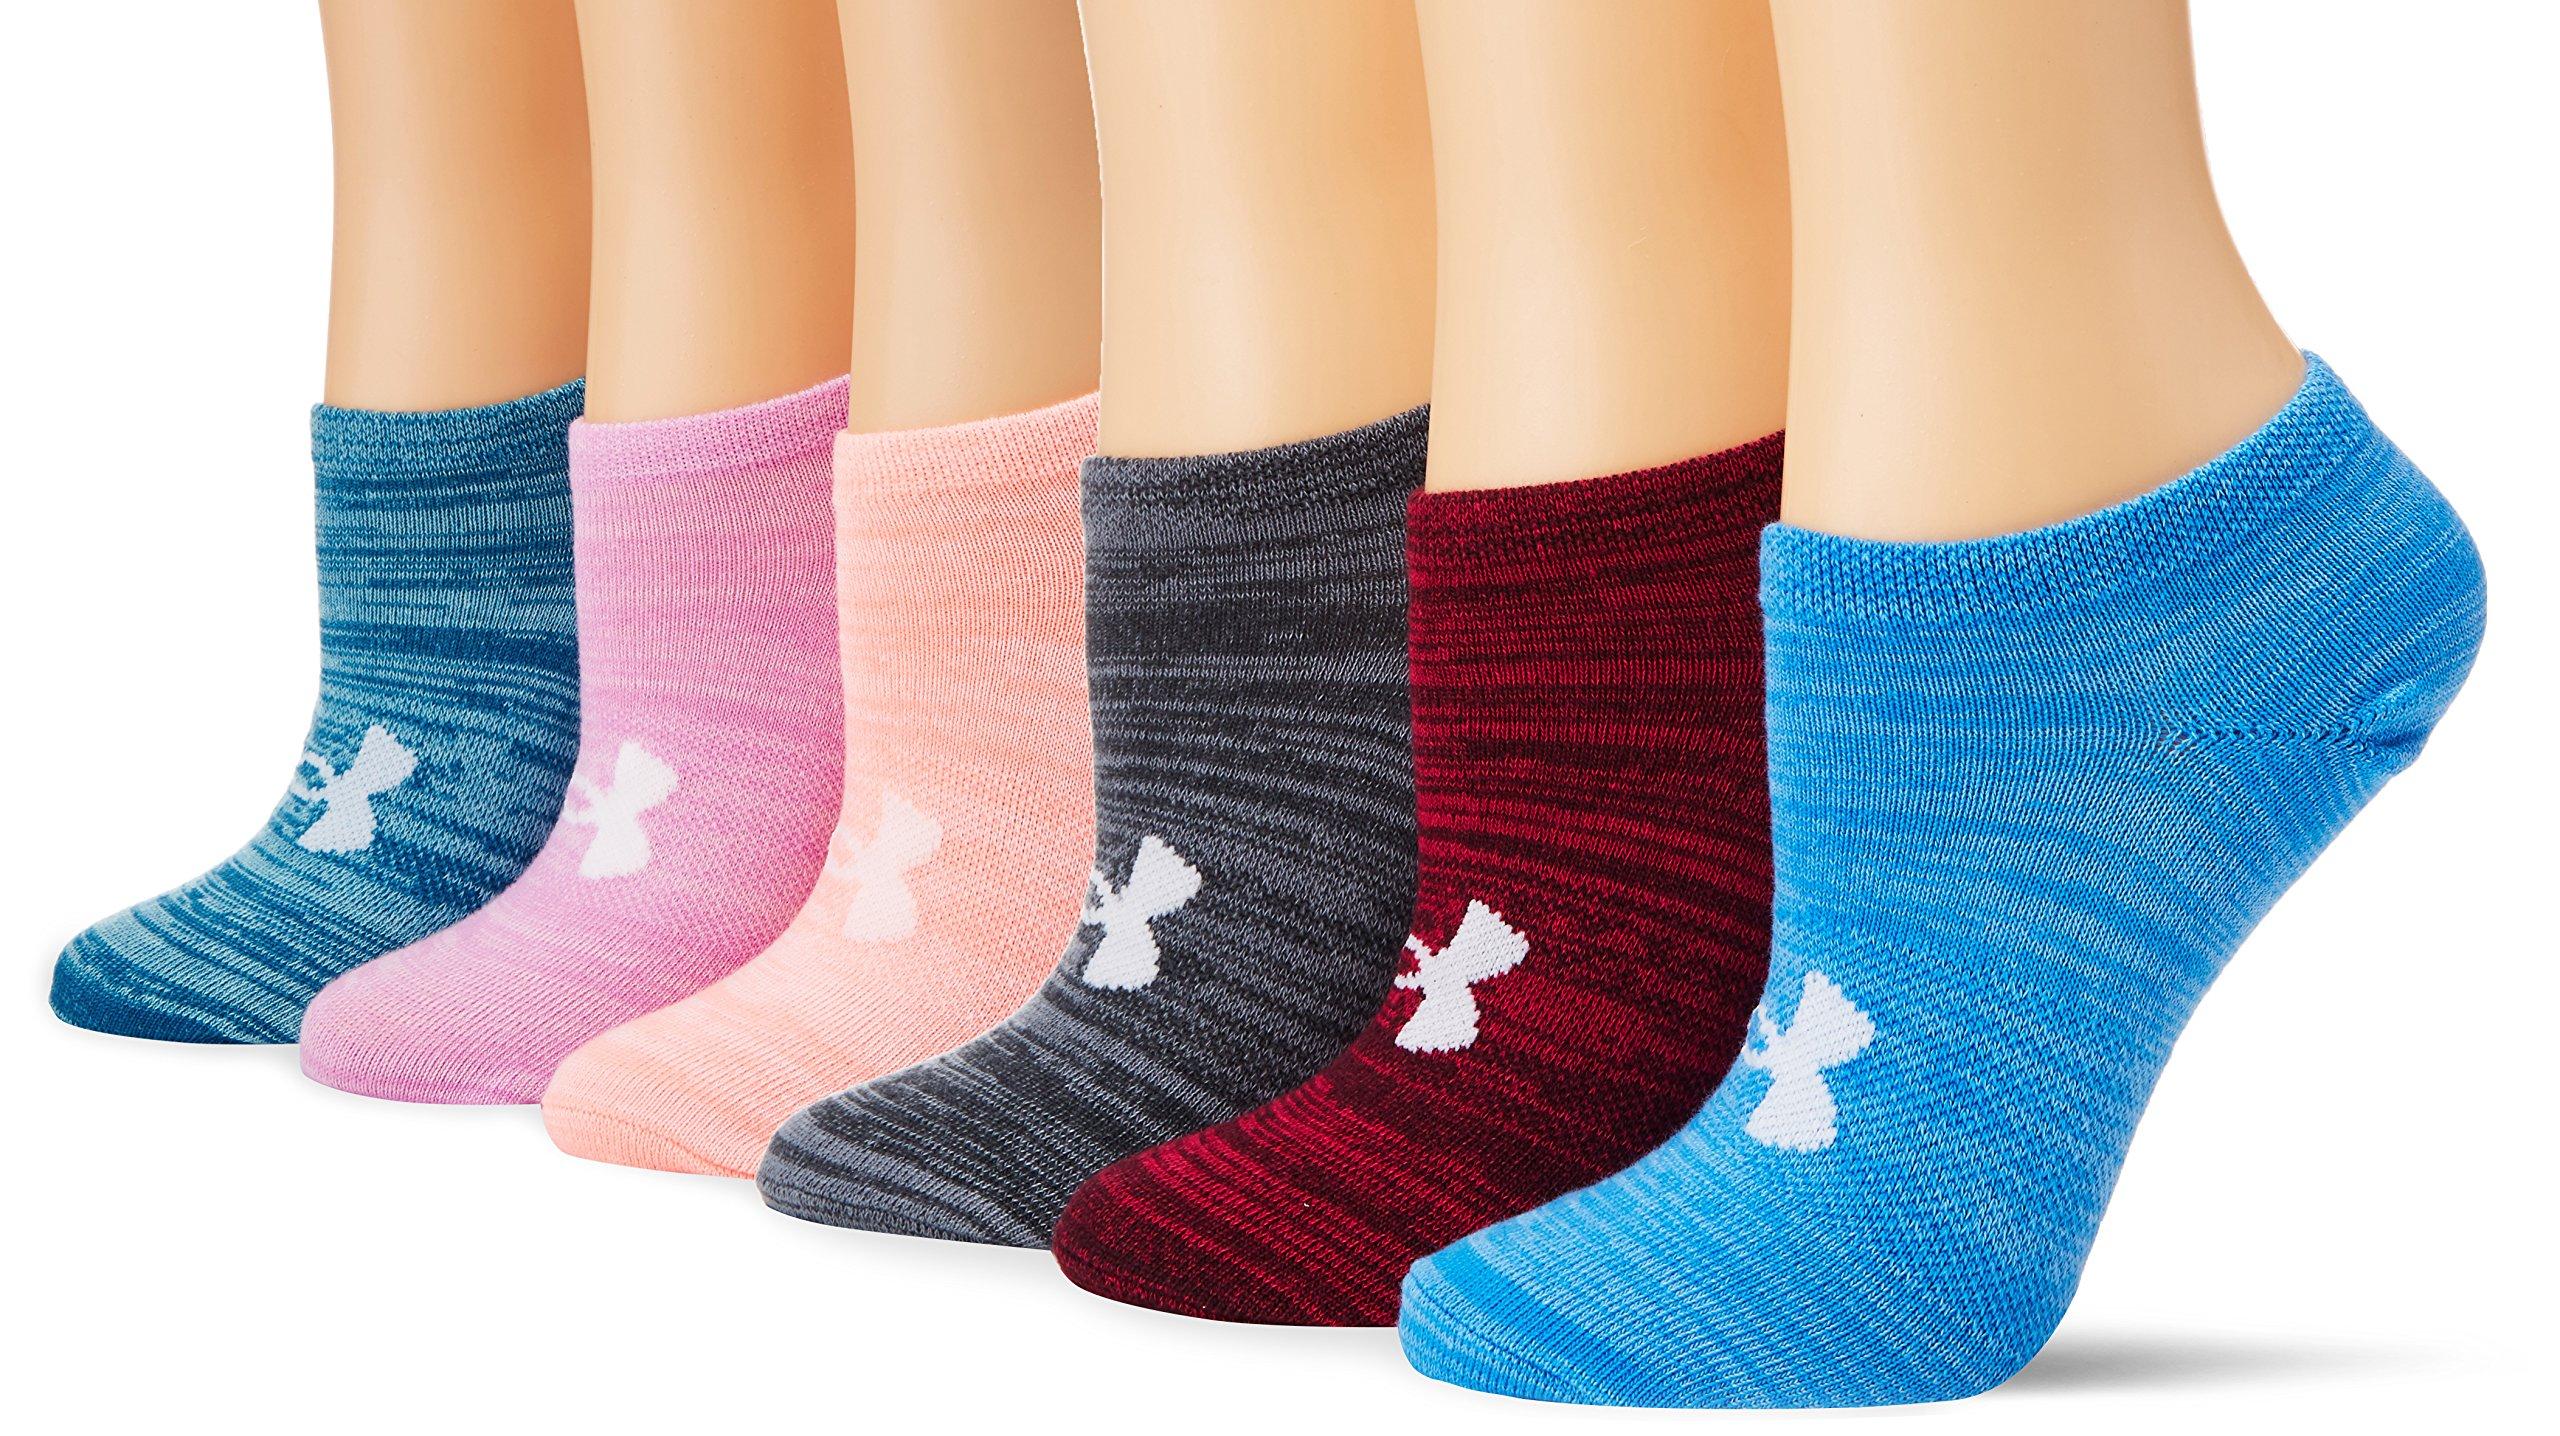 Under Armour Women's Essential Twist No Show Socks (6 Pack), Honeysuckle/Assorted, Medium